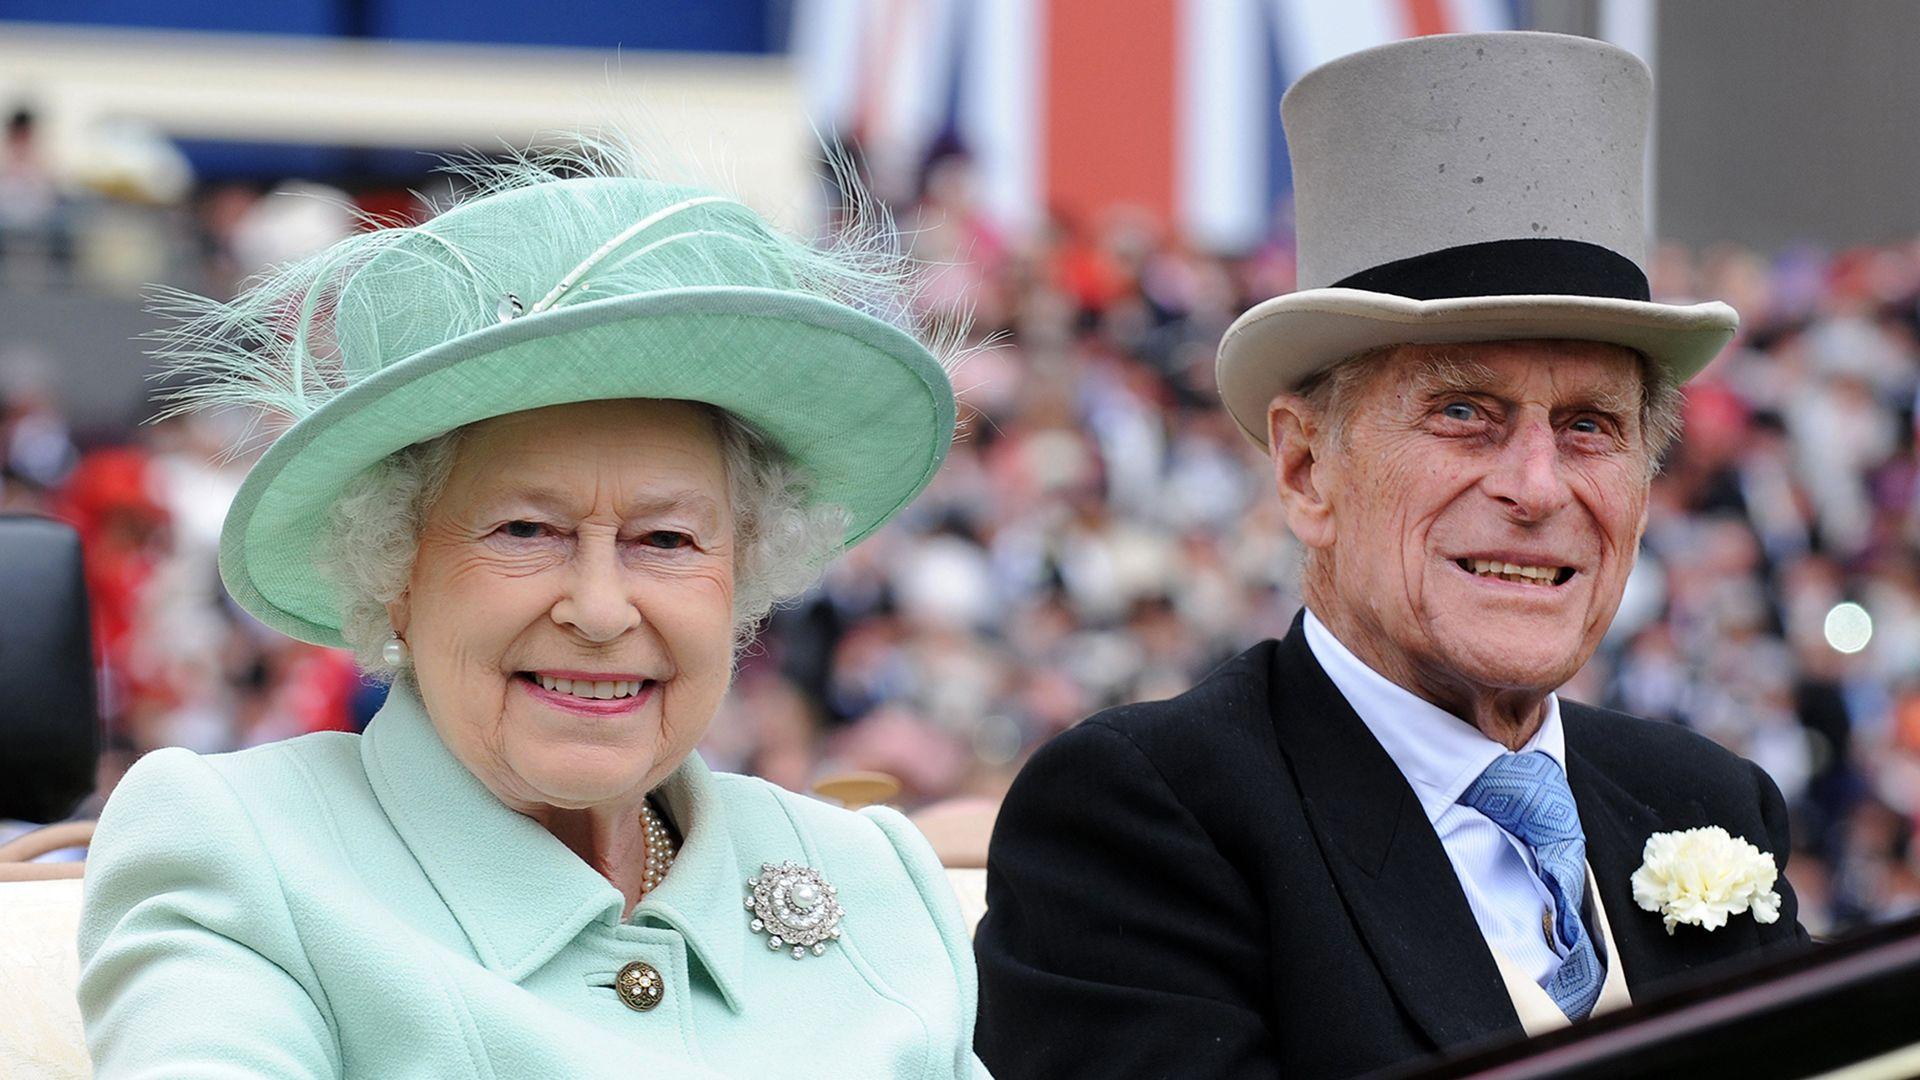 The British royal matriarch, Queen Elizabeth II, will ring